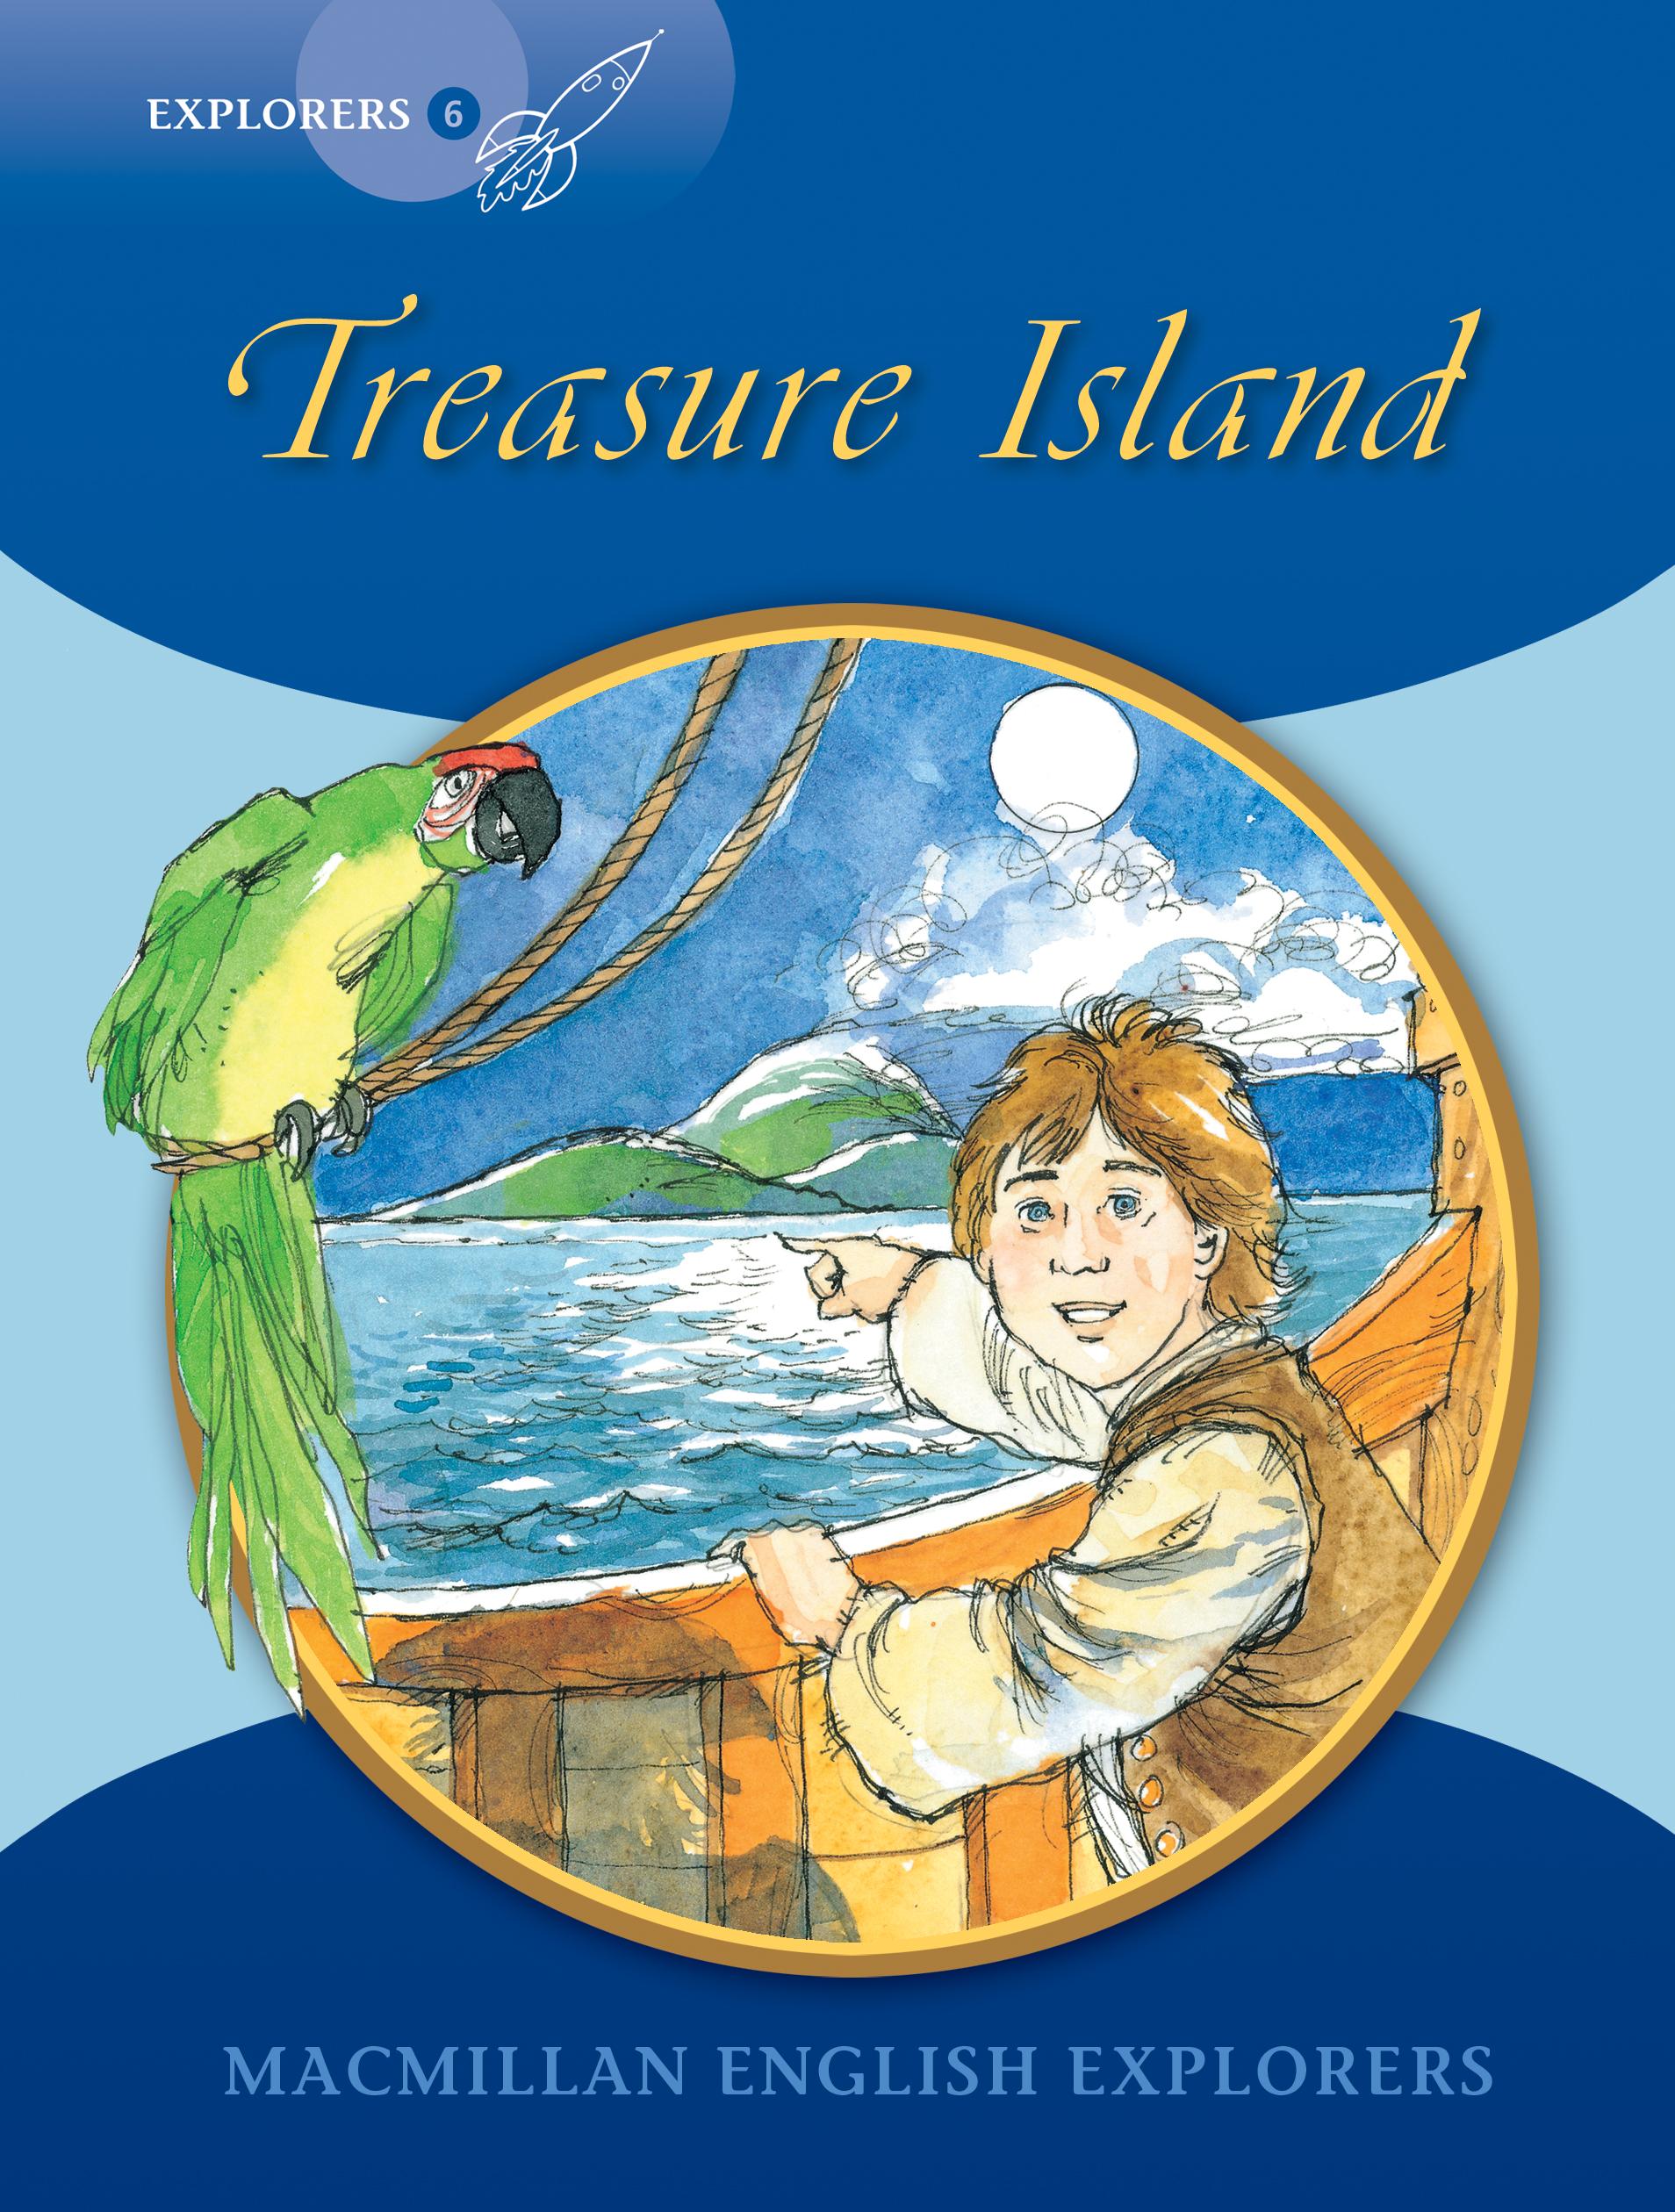 Explorers 6: Treasure Island